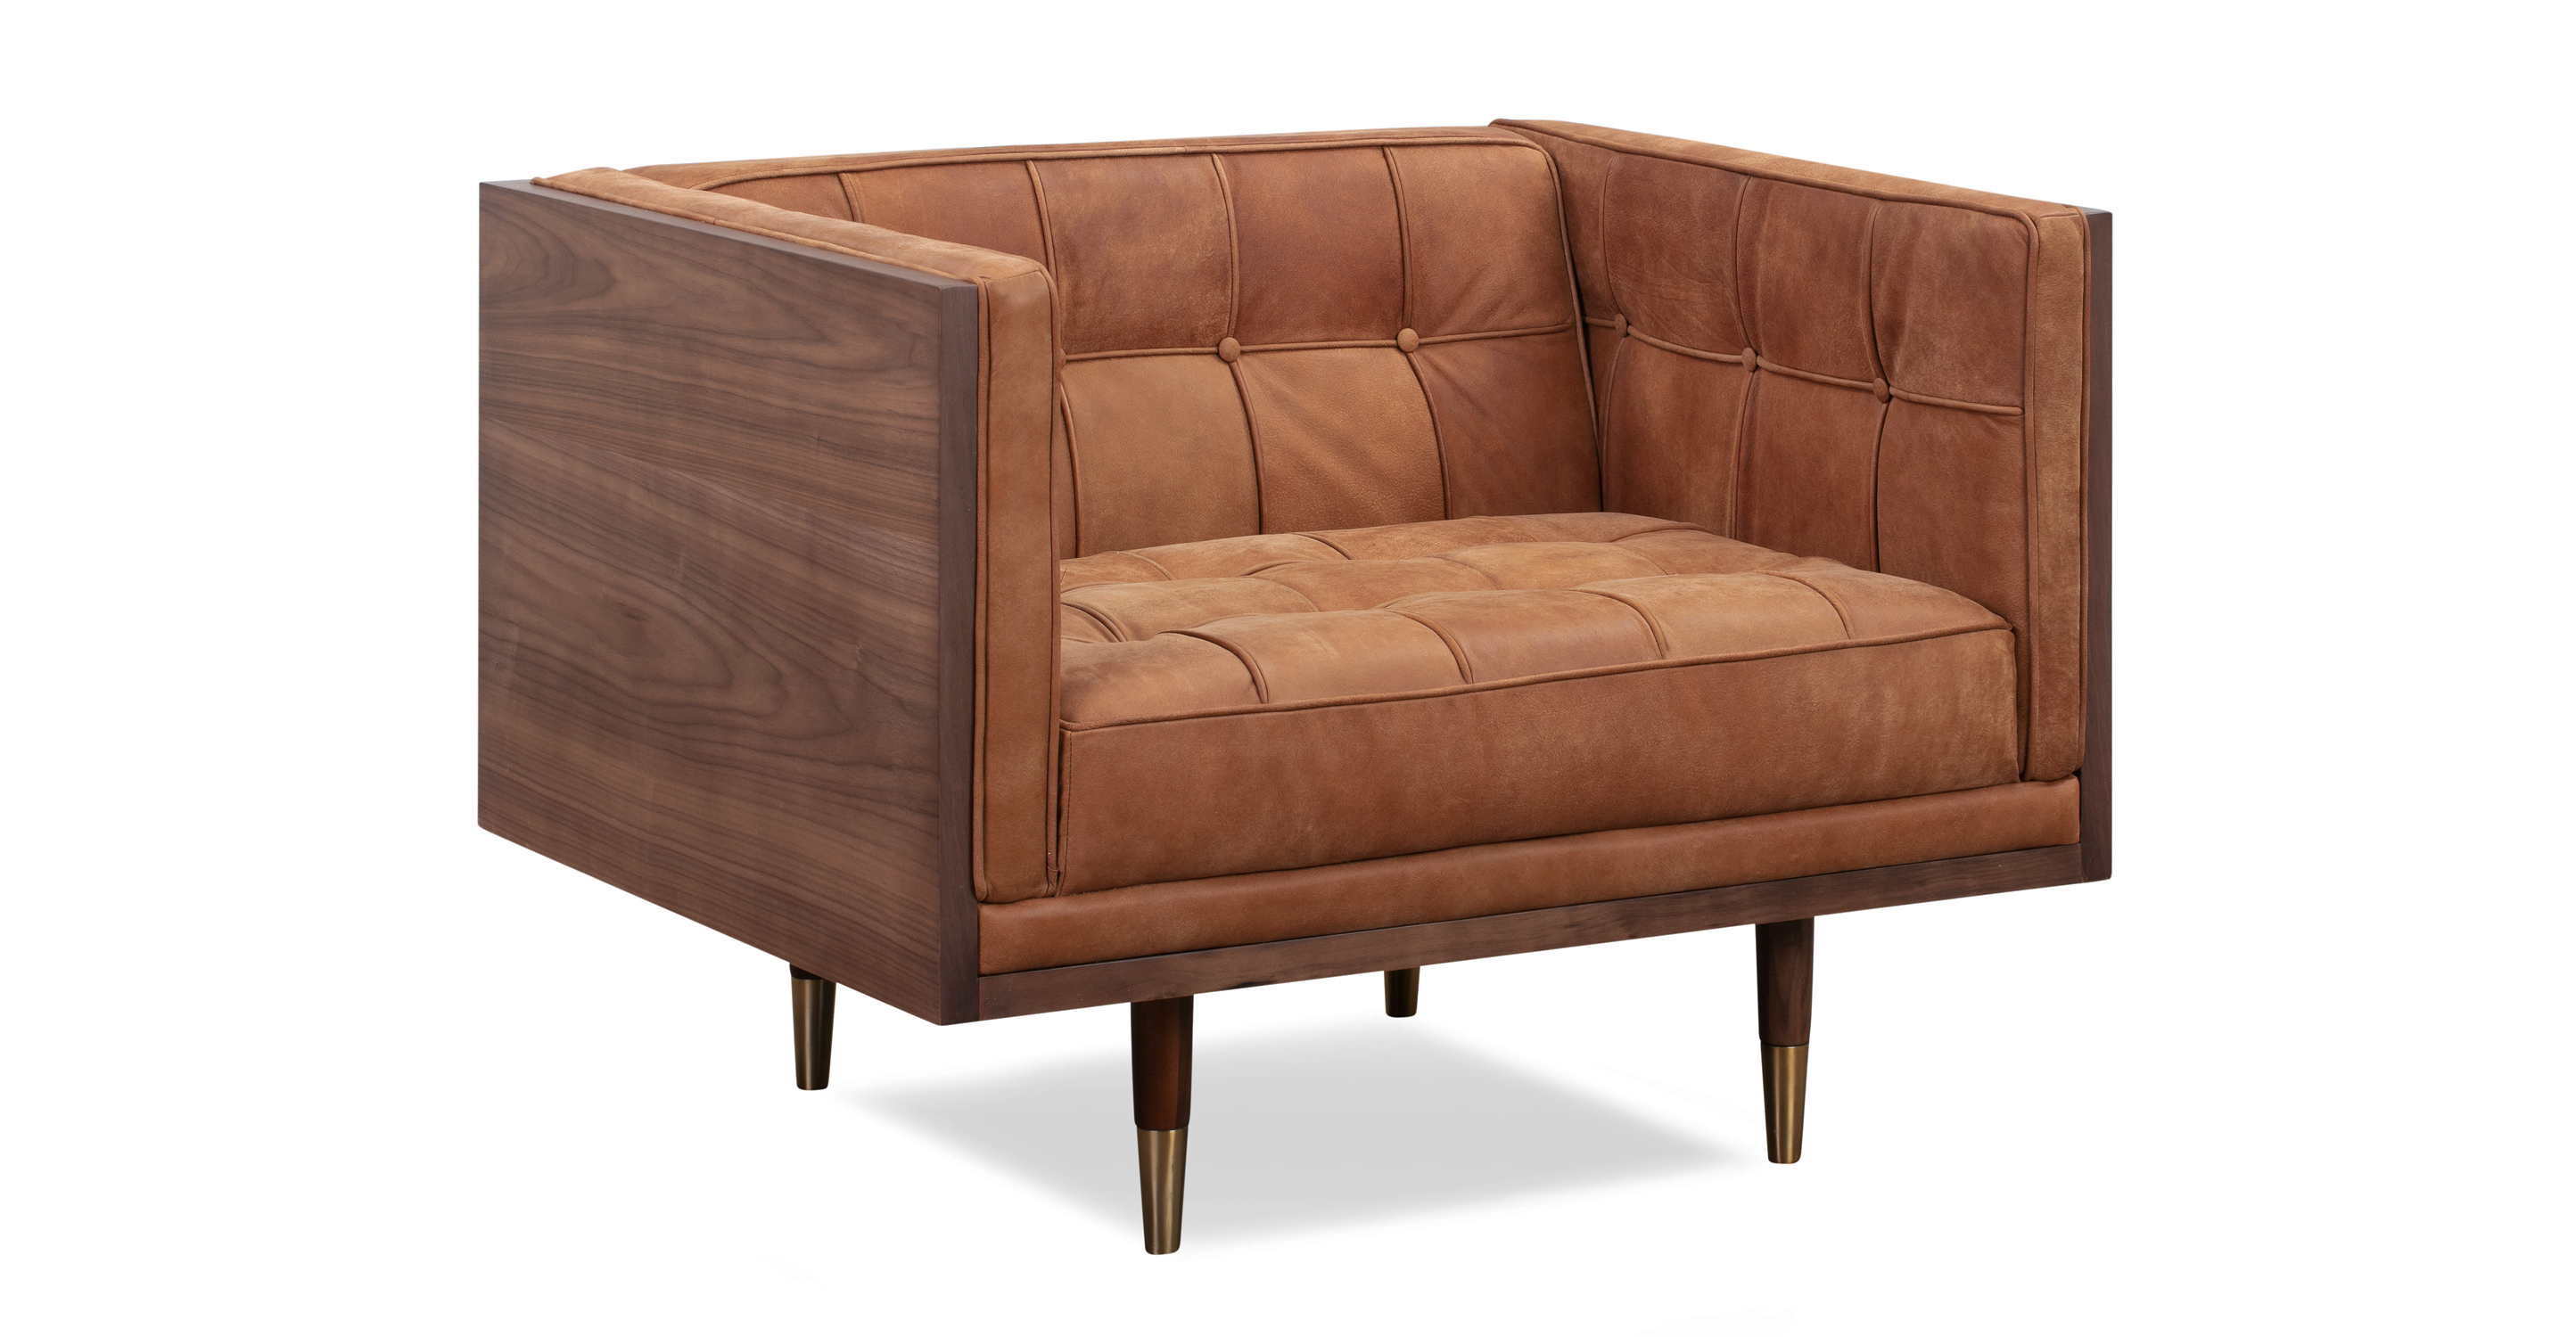 Woodrow Box Chair, Walnut/Cognac Full Grain Aniline